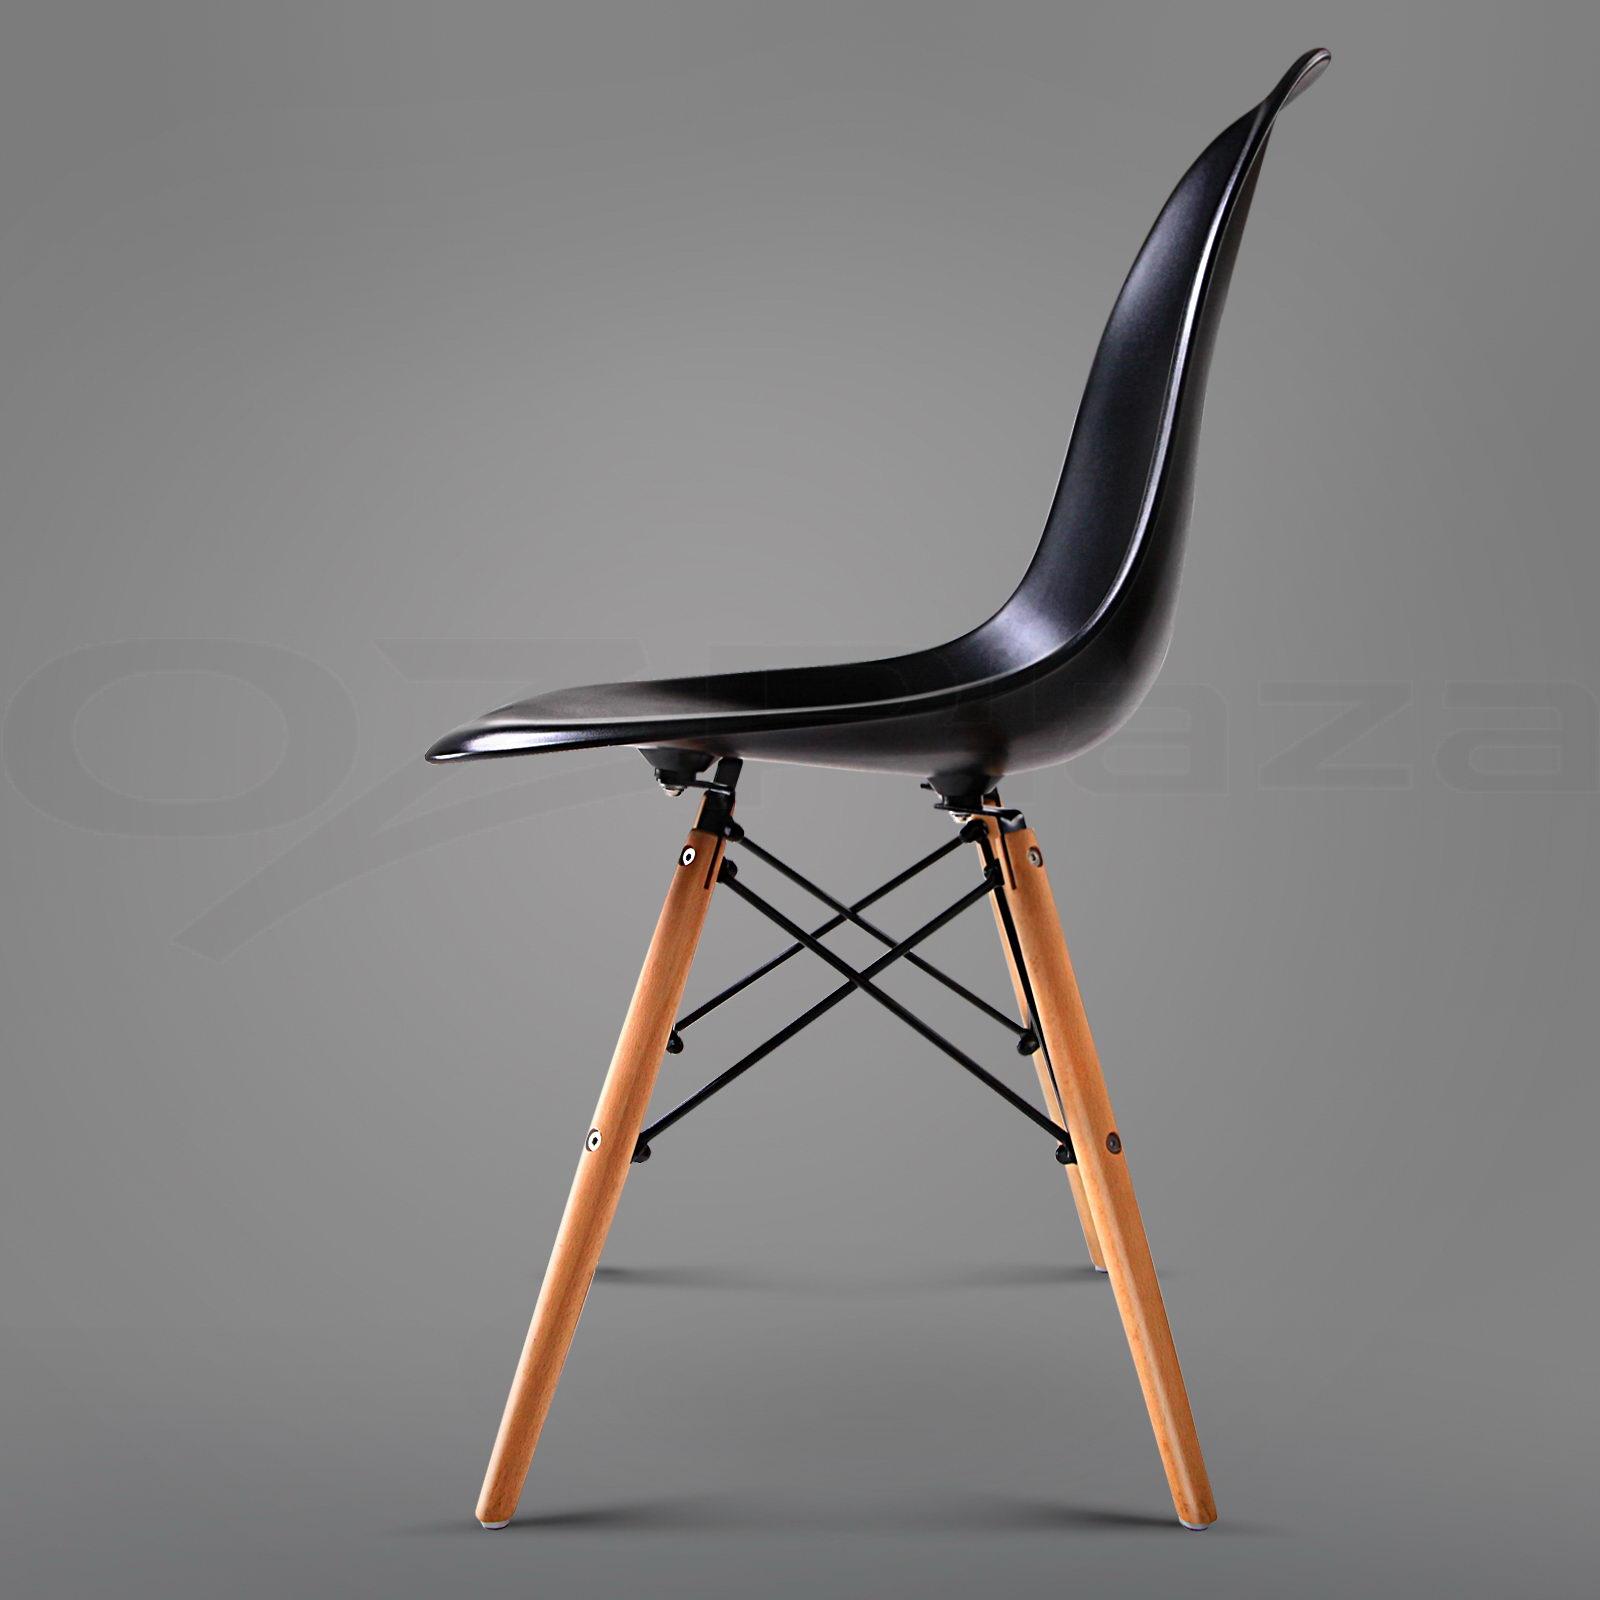 6 x retro replica eames eiffel dsw dining chair daw armchair beech wood abs - Eames dsw eiffel chair ...